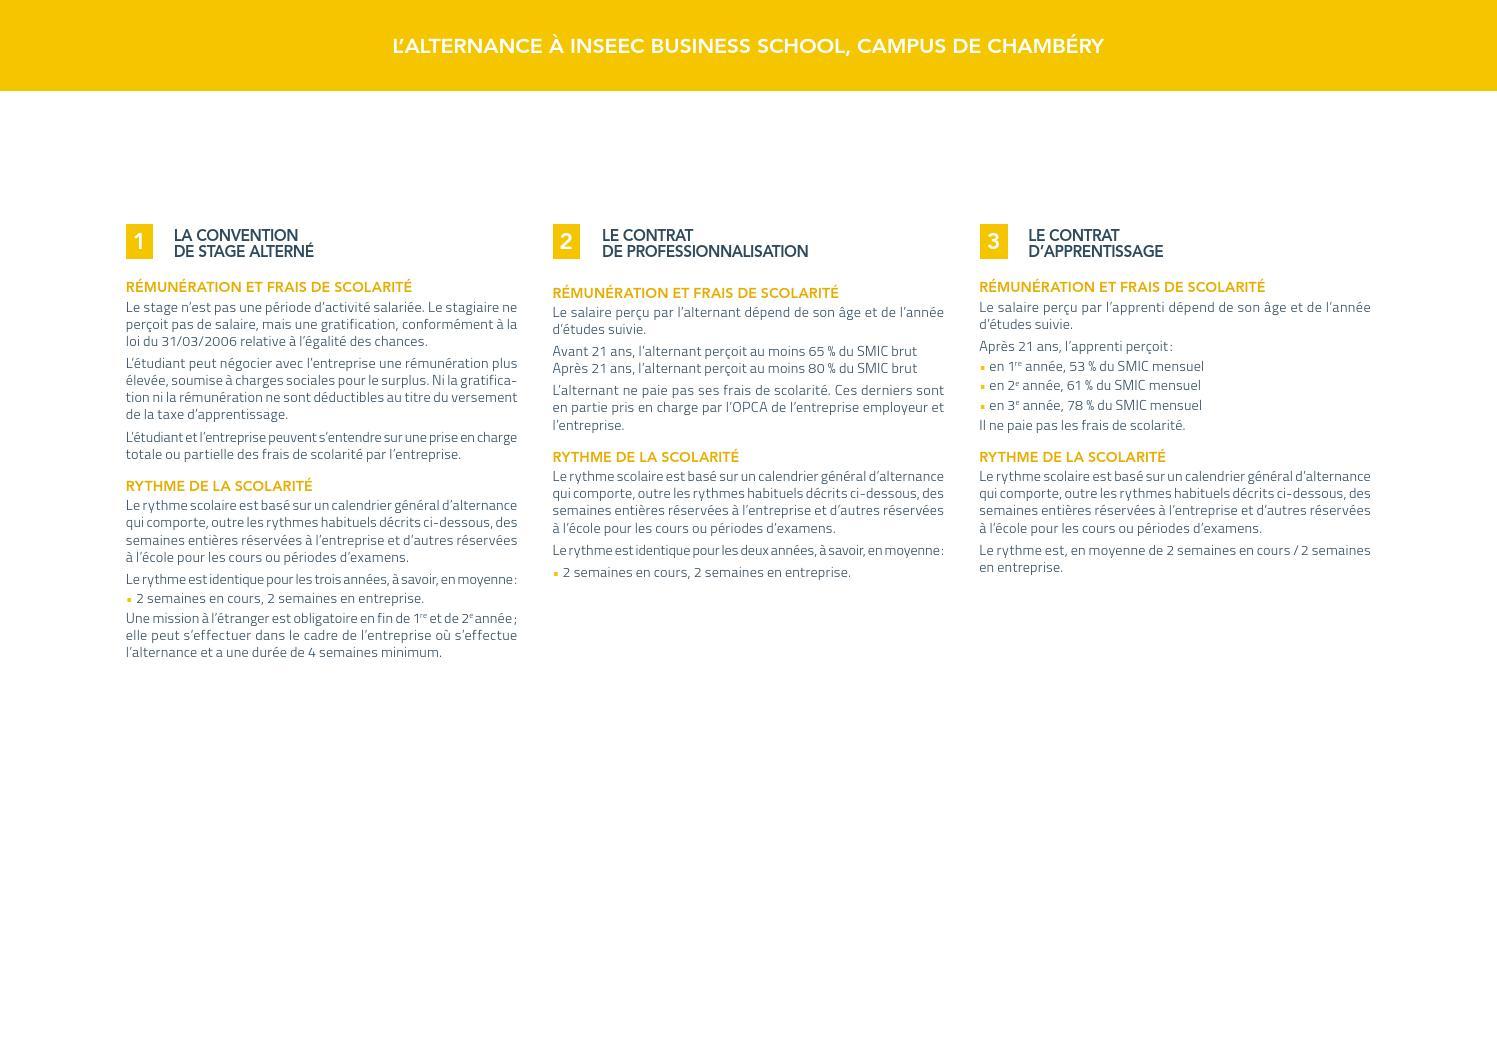 Inseec Business School Cursus En Alternance By O Et D Issuu